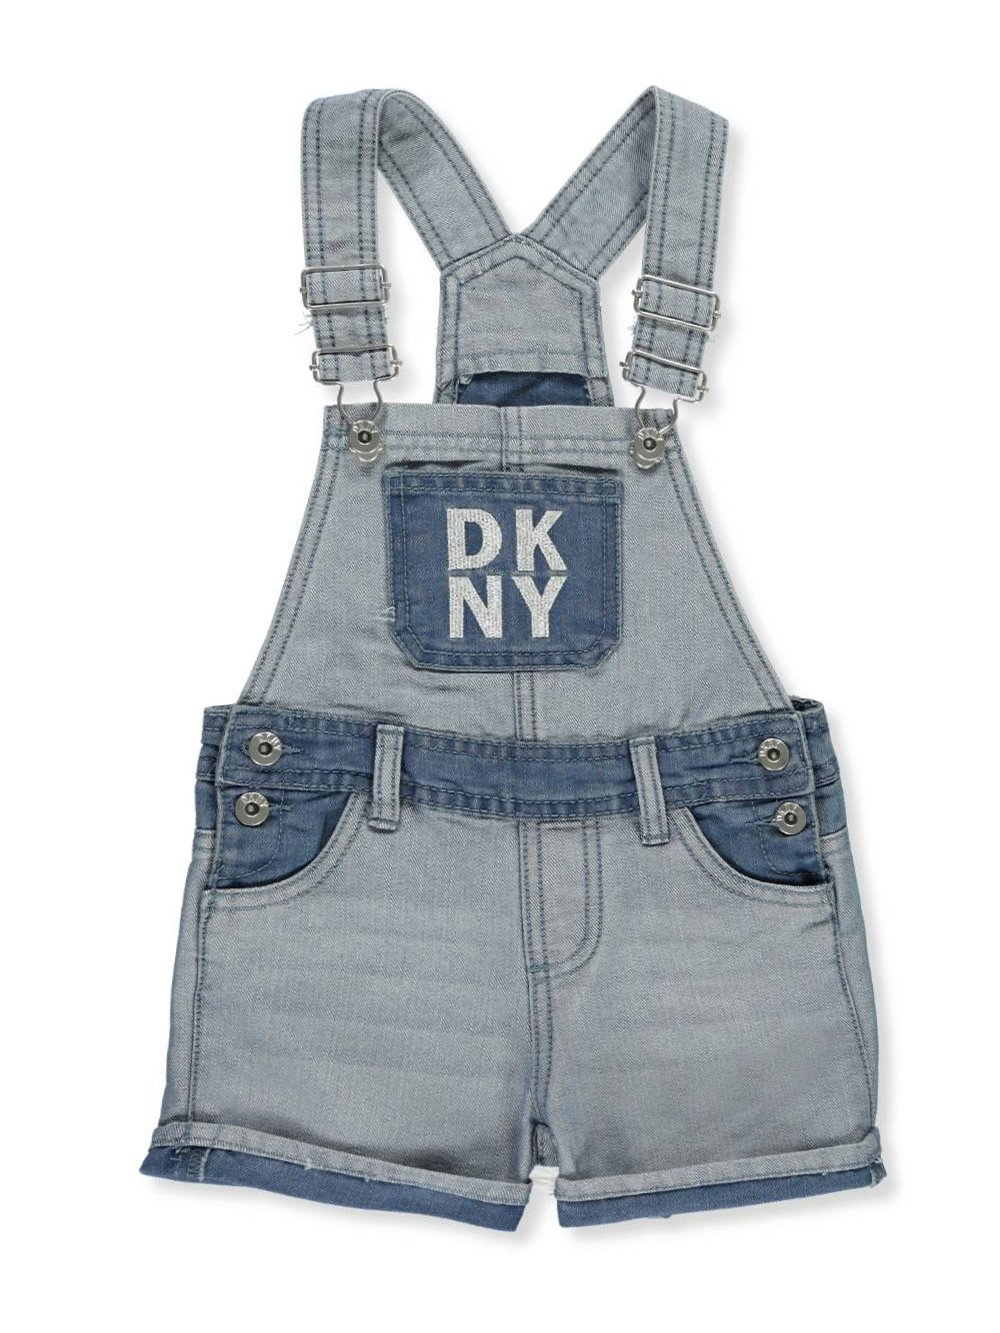 DKNY Girls' Denim Shortalls - Light wash, 4